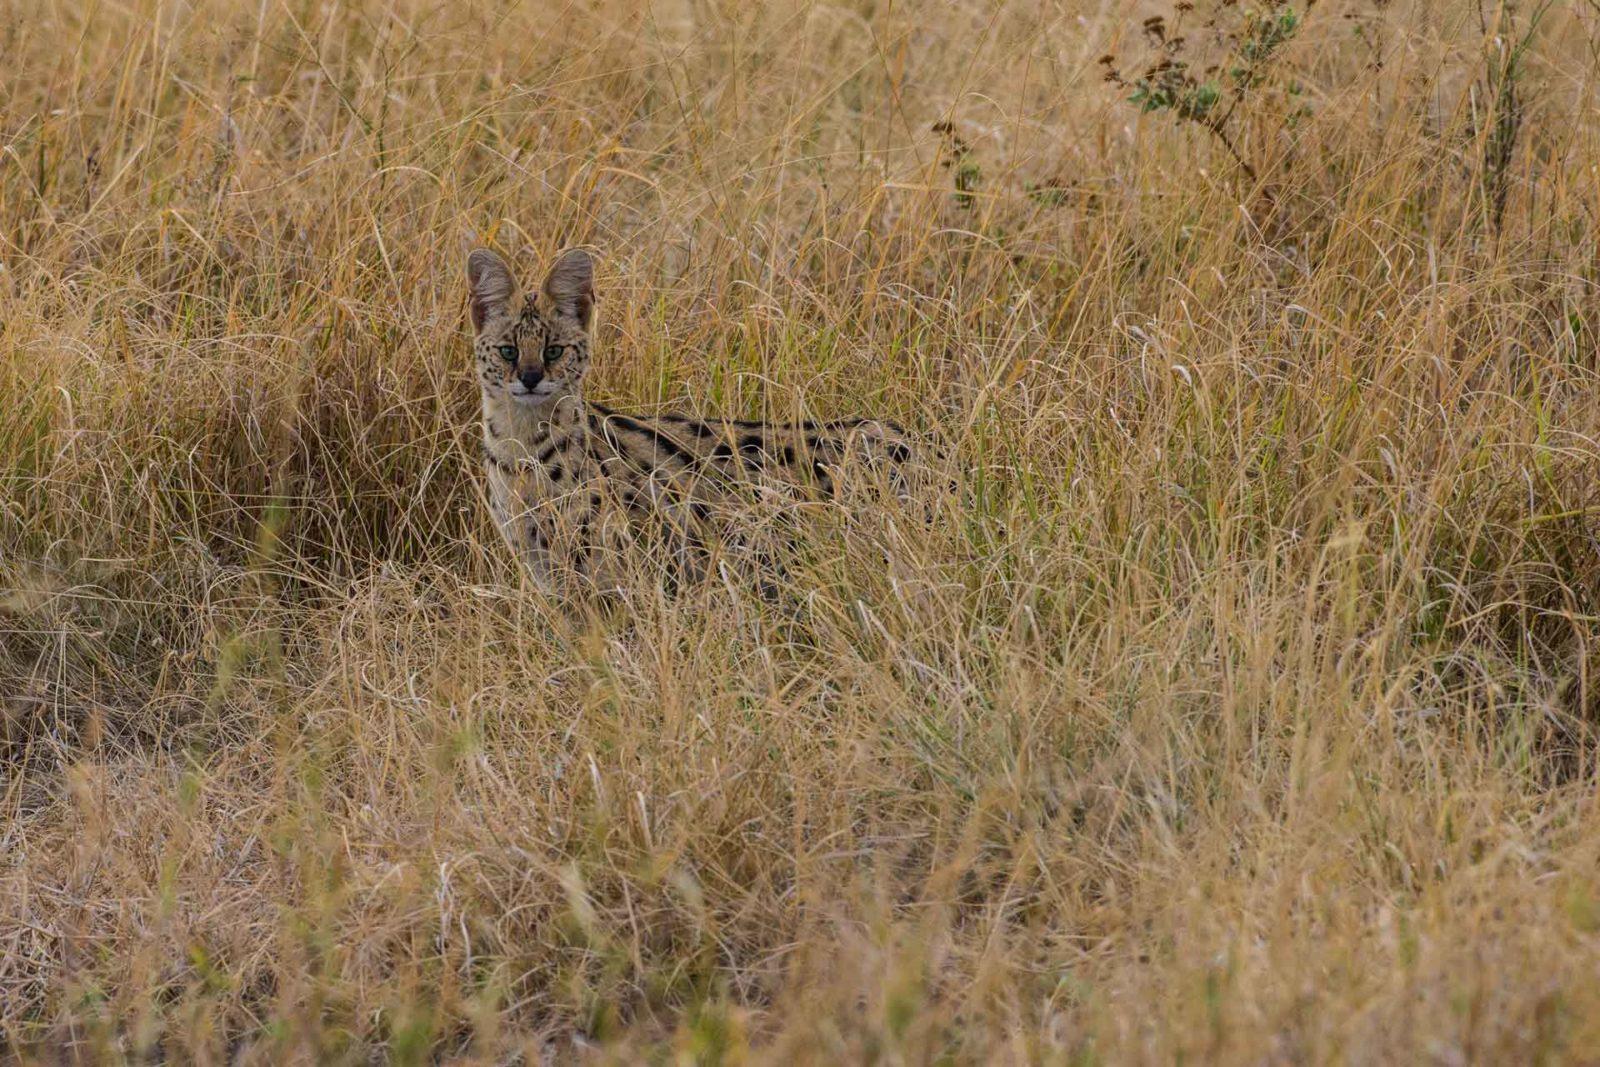 africa wildlife cat in grass